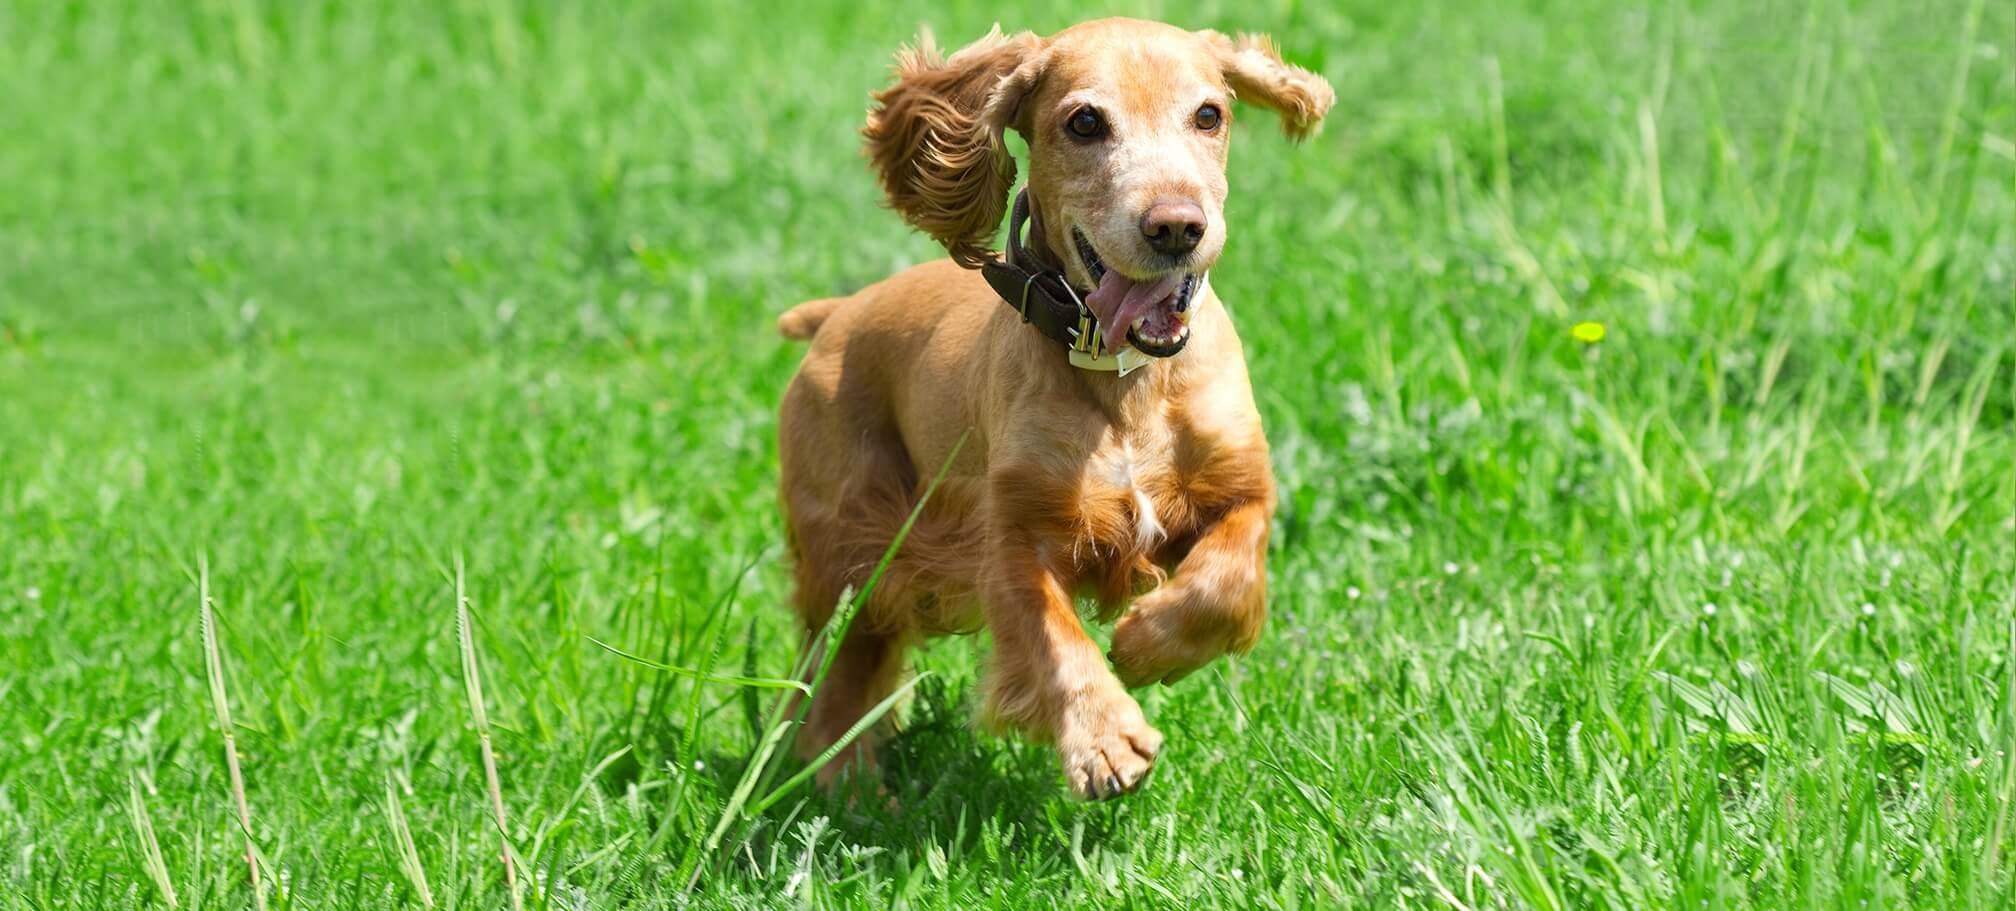 Cocker spaniel dog running in field